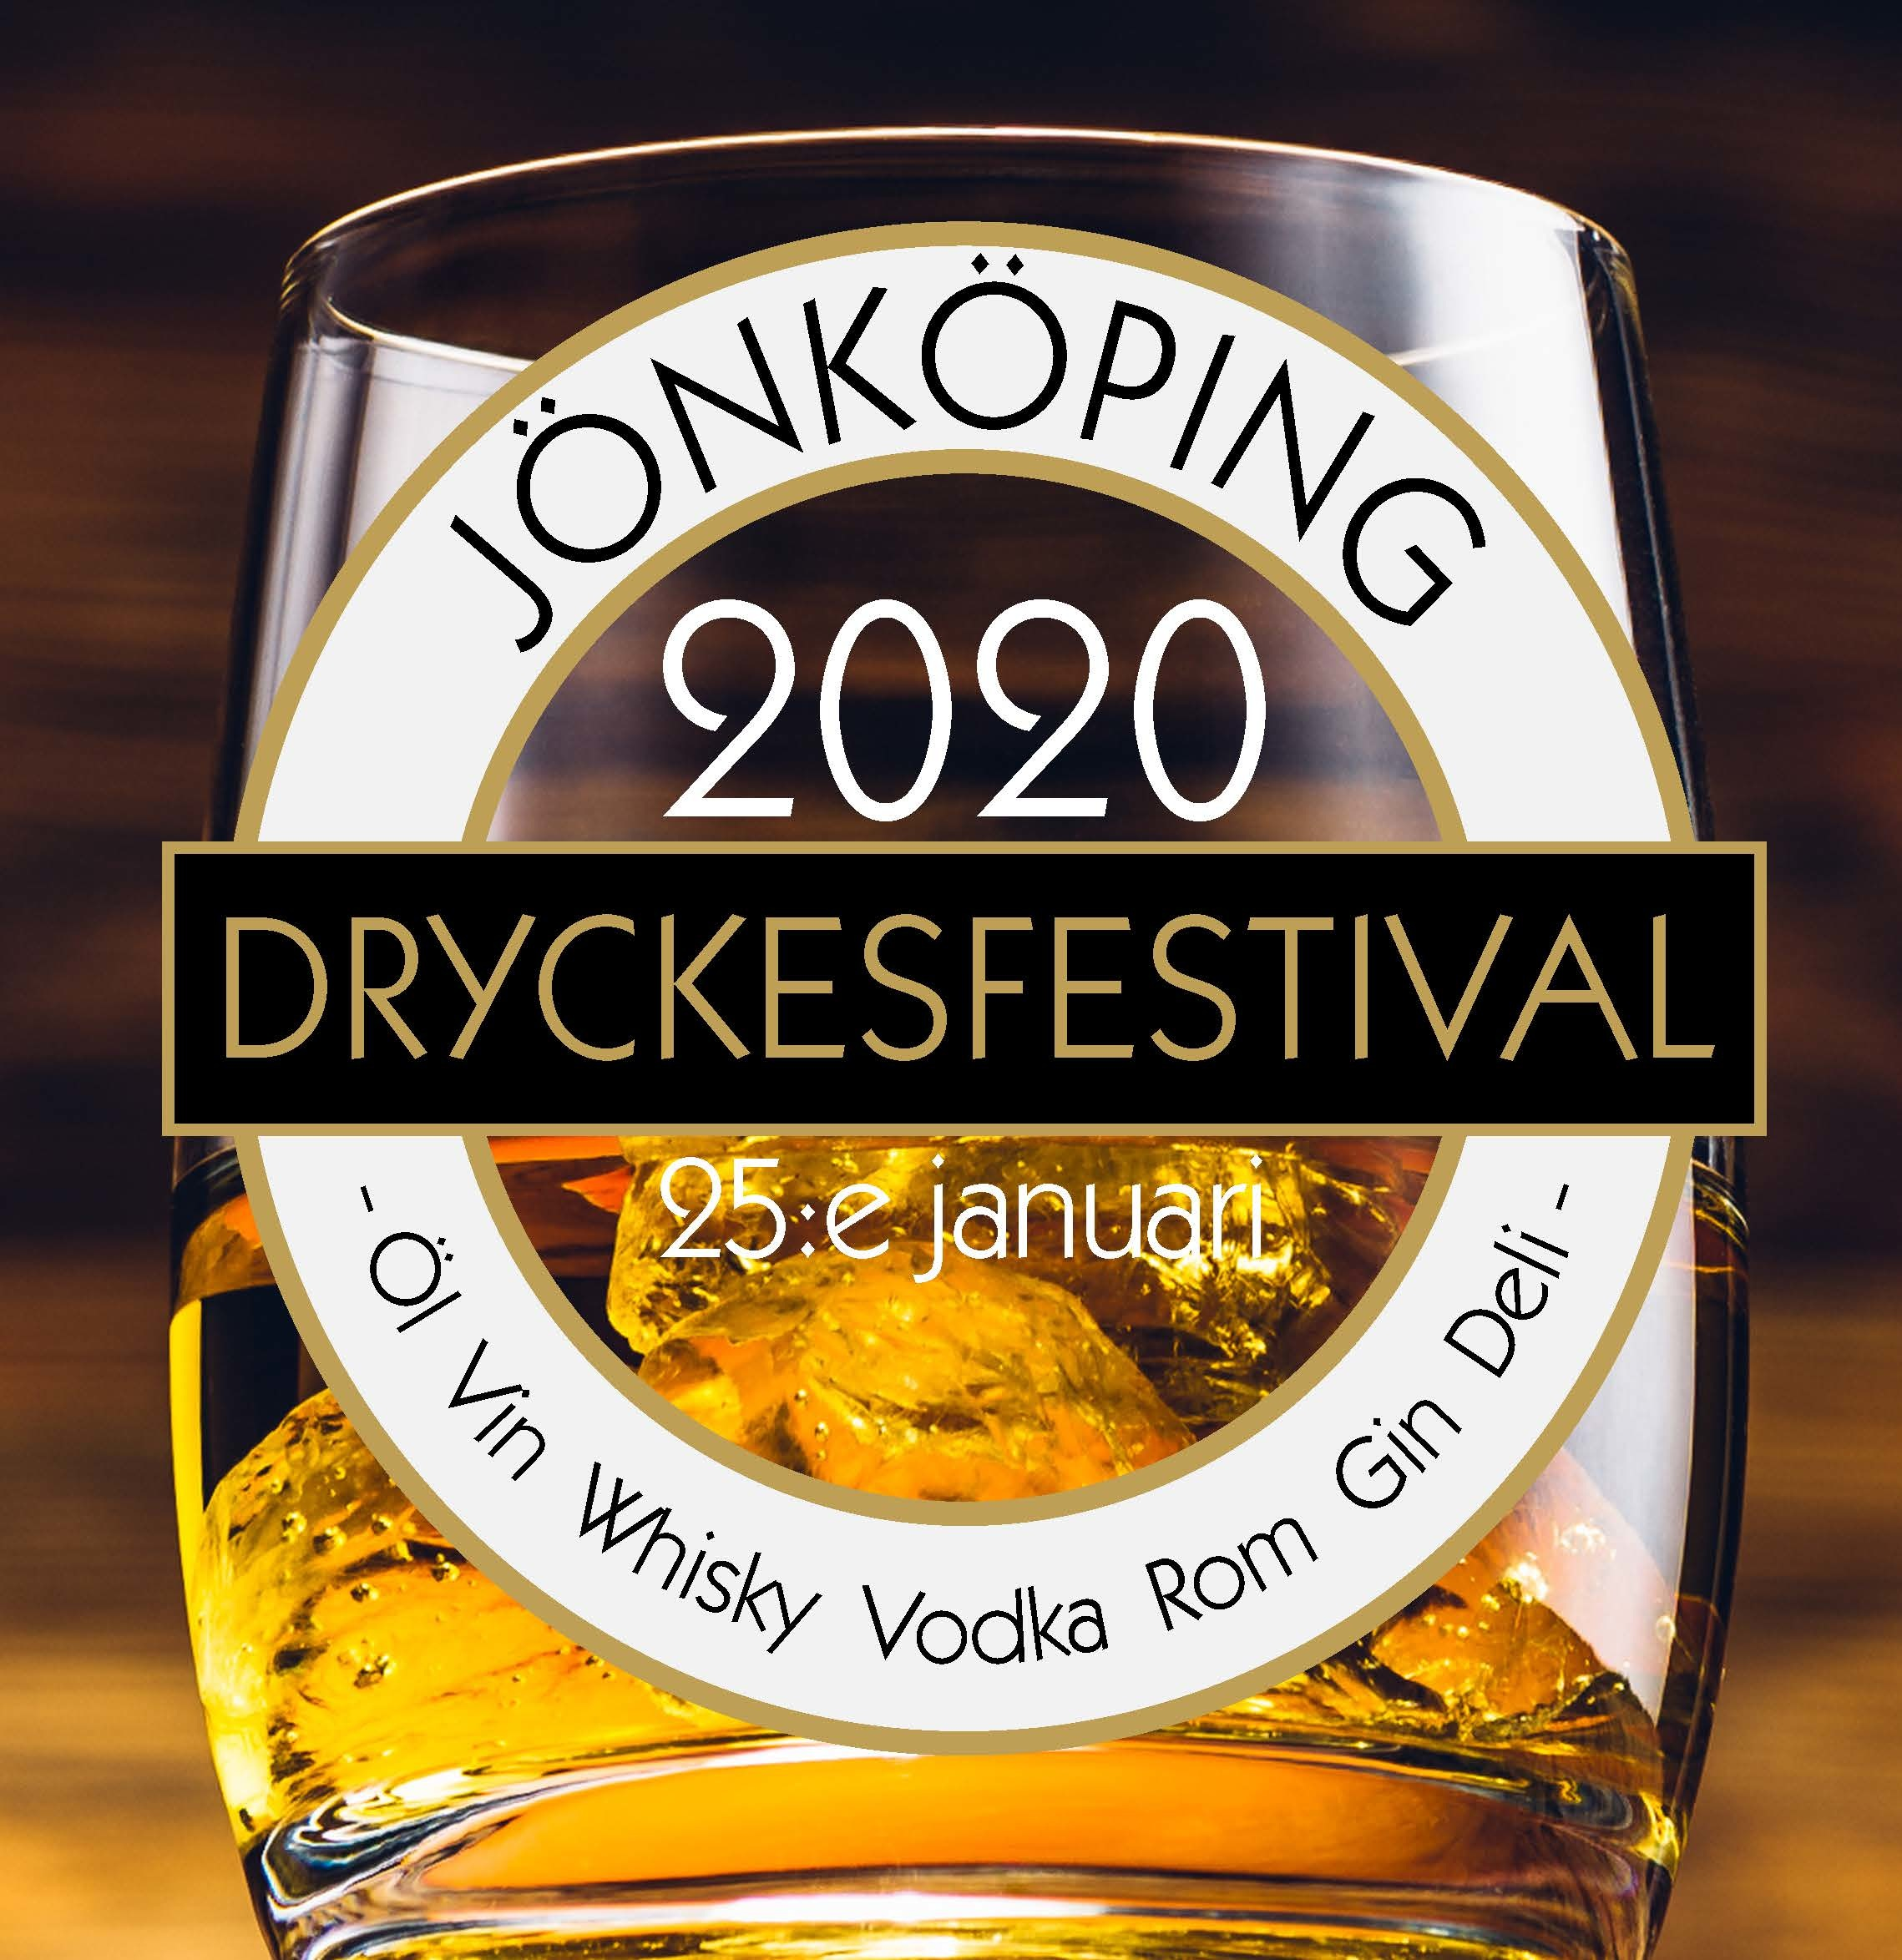 Jönköping Dryckesfestival whisky